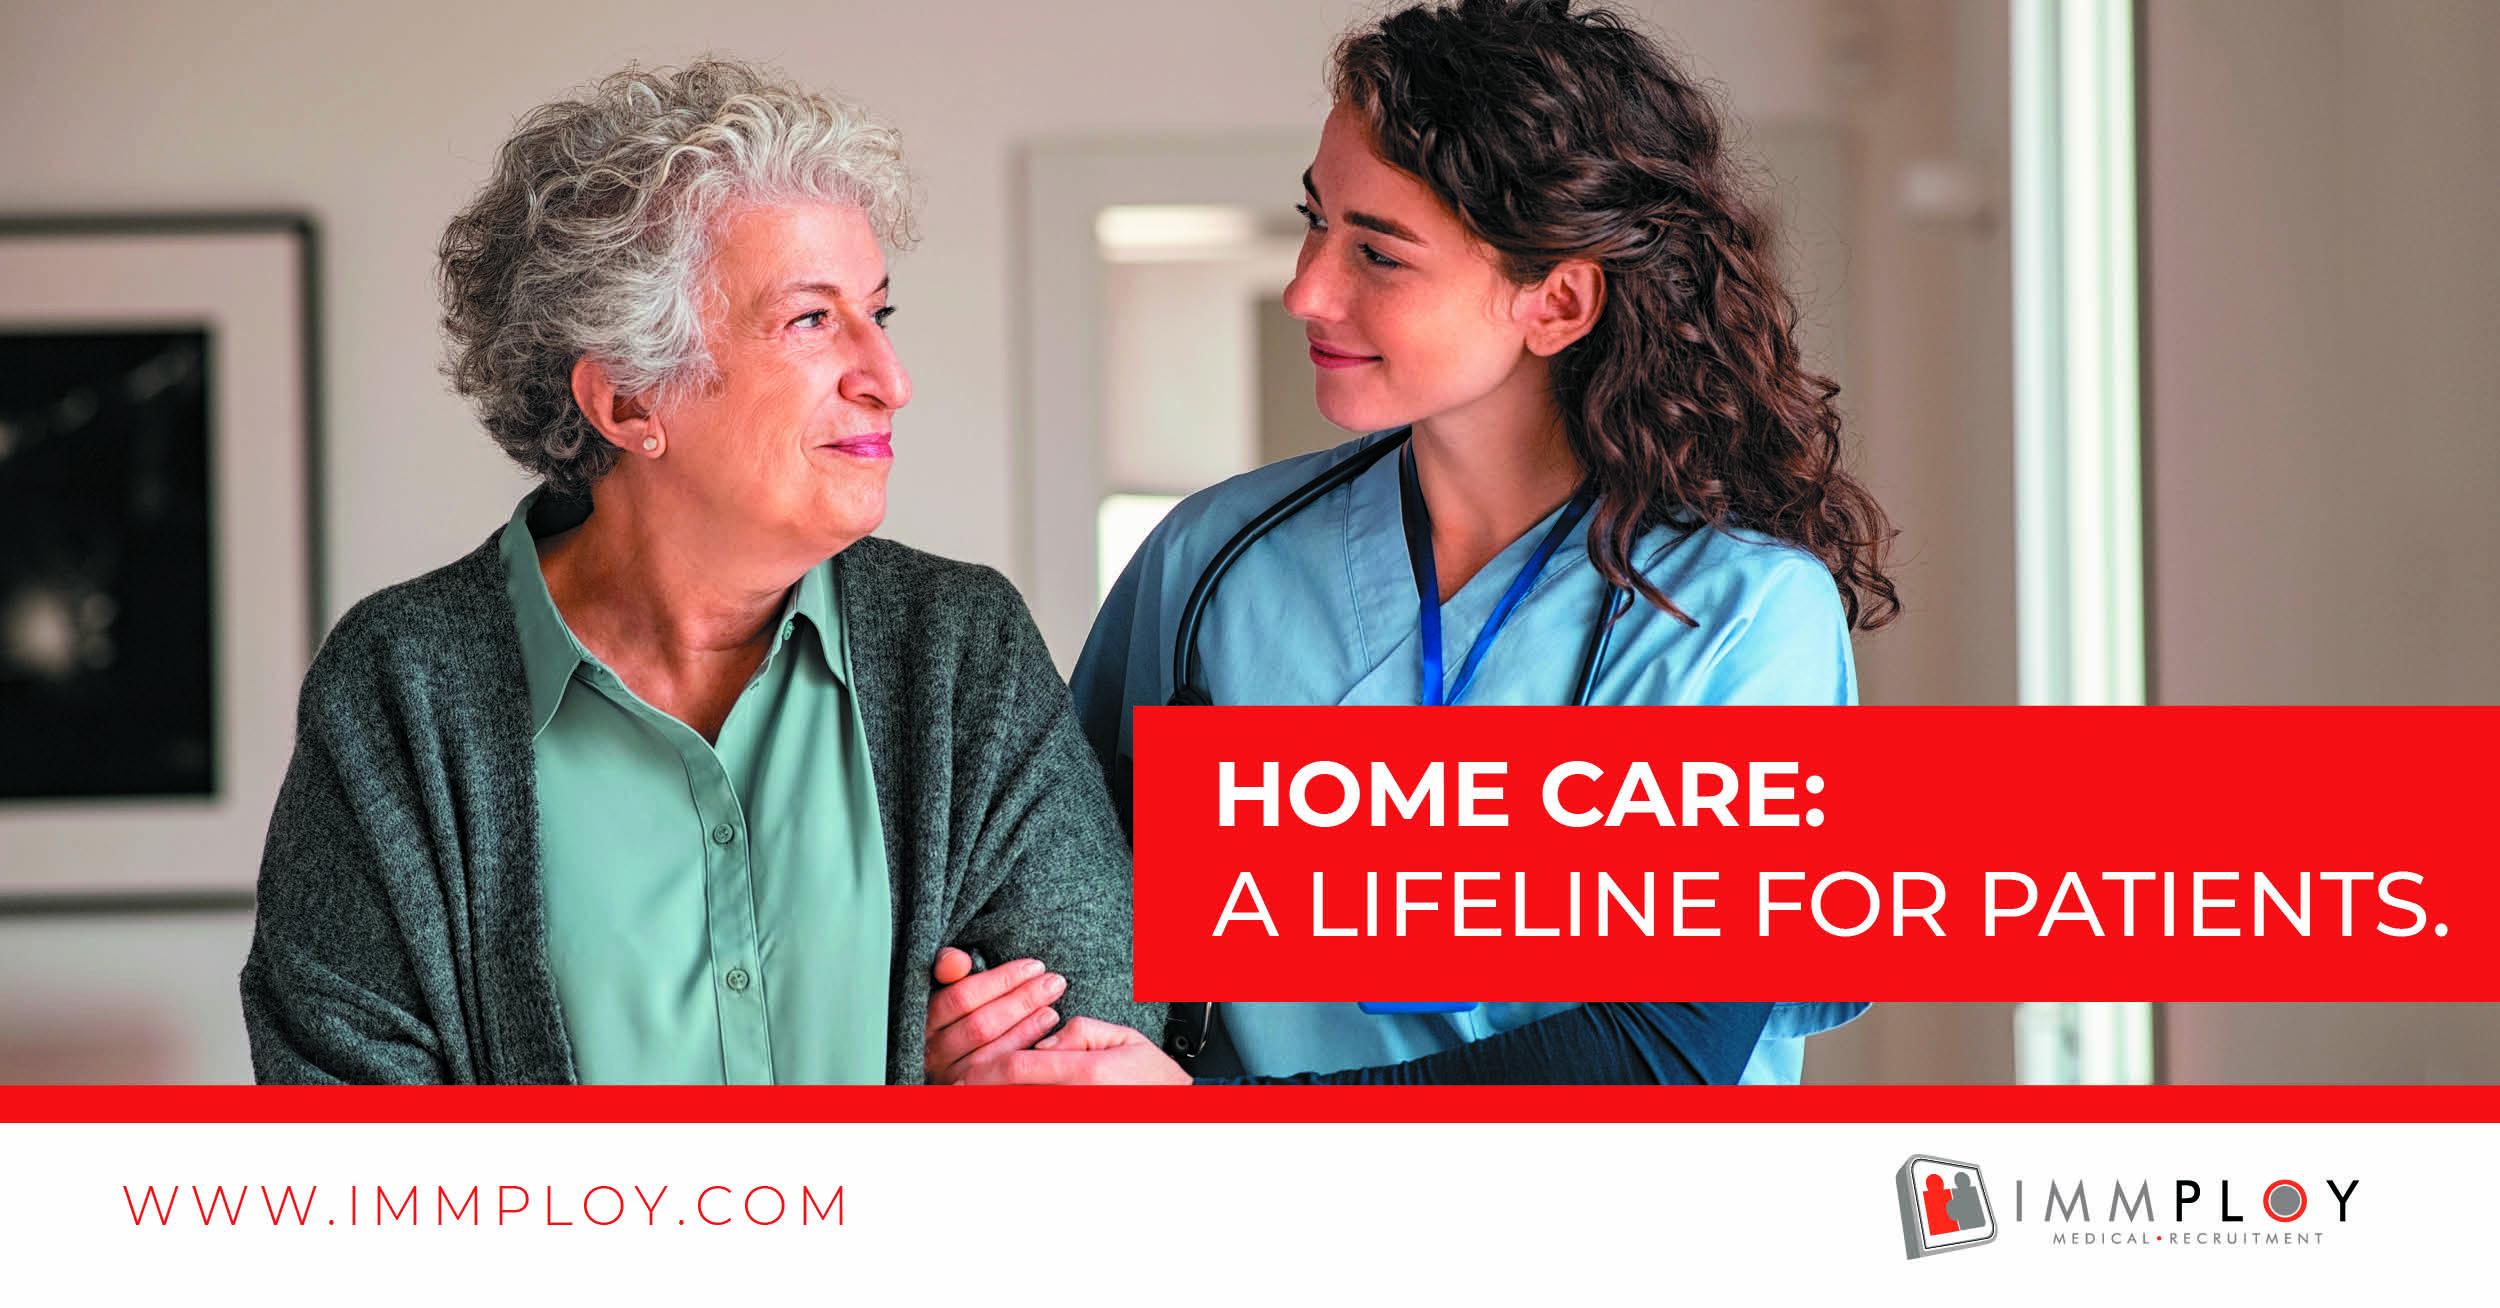 Home Care: A Lifeline for Patients